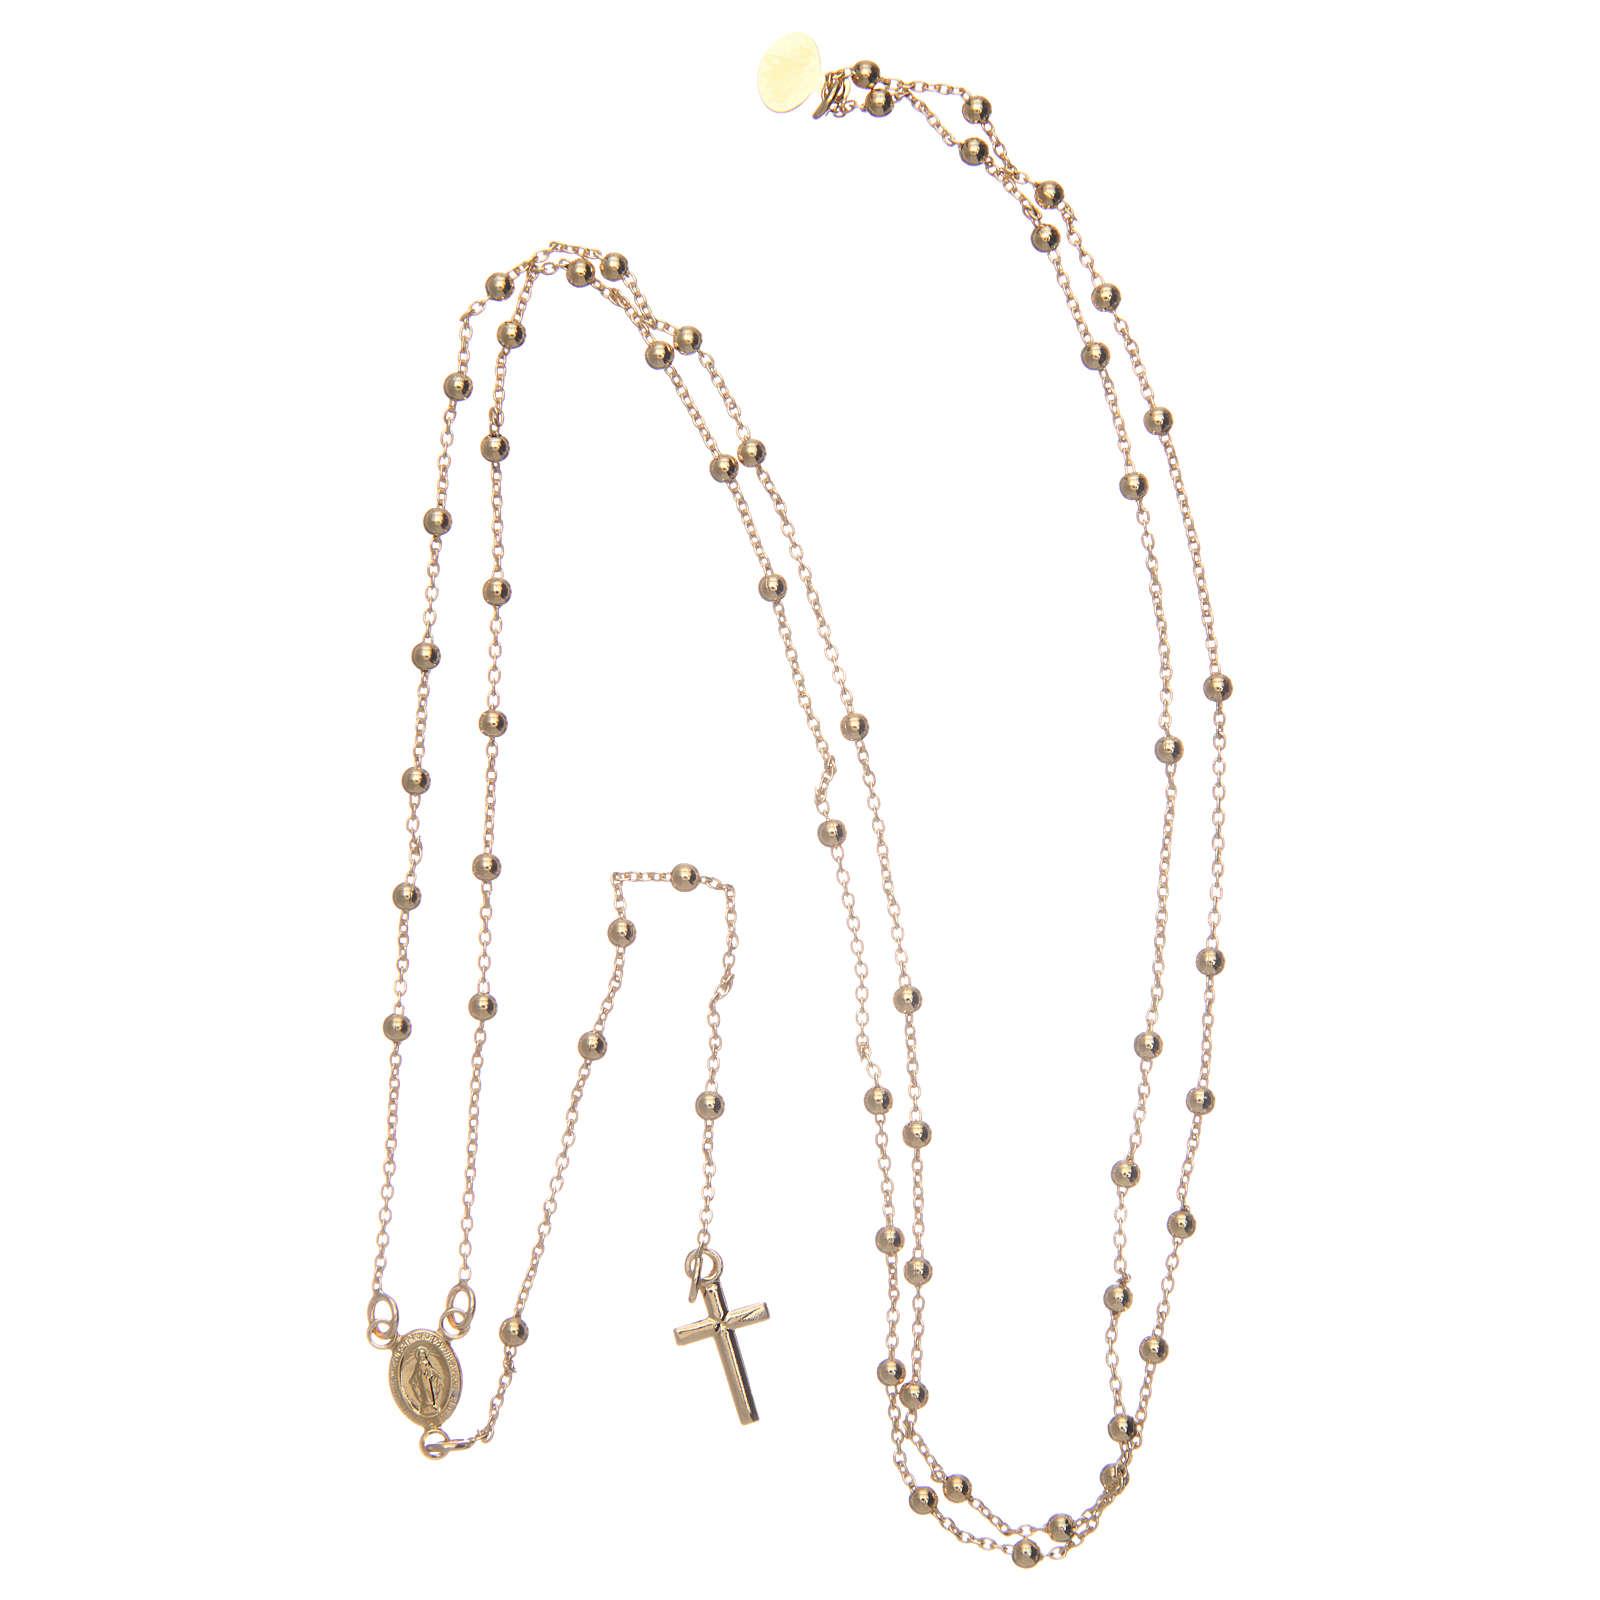 AMEN rosary necklace 2,5 mm diameter bronze yellow 4